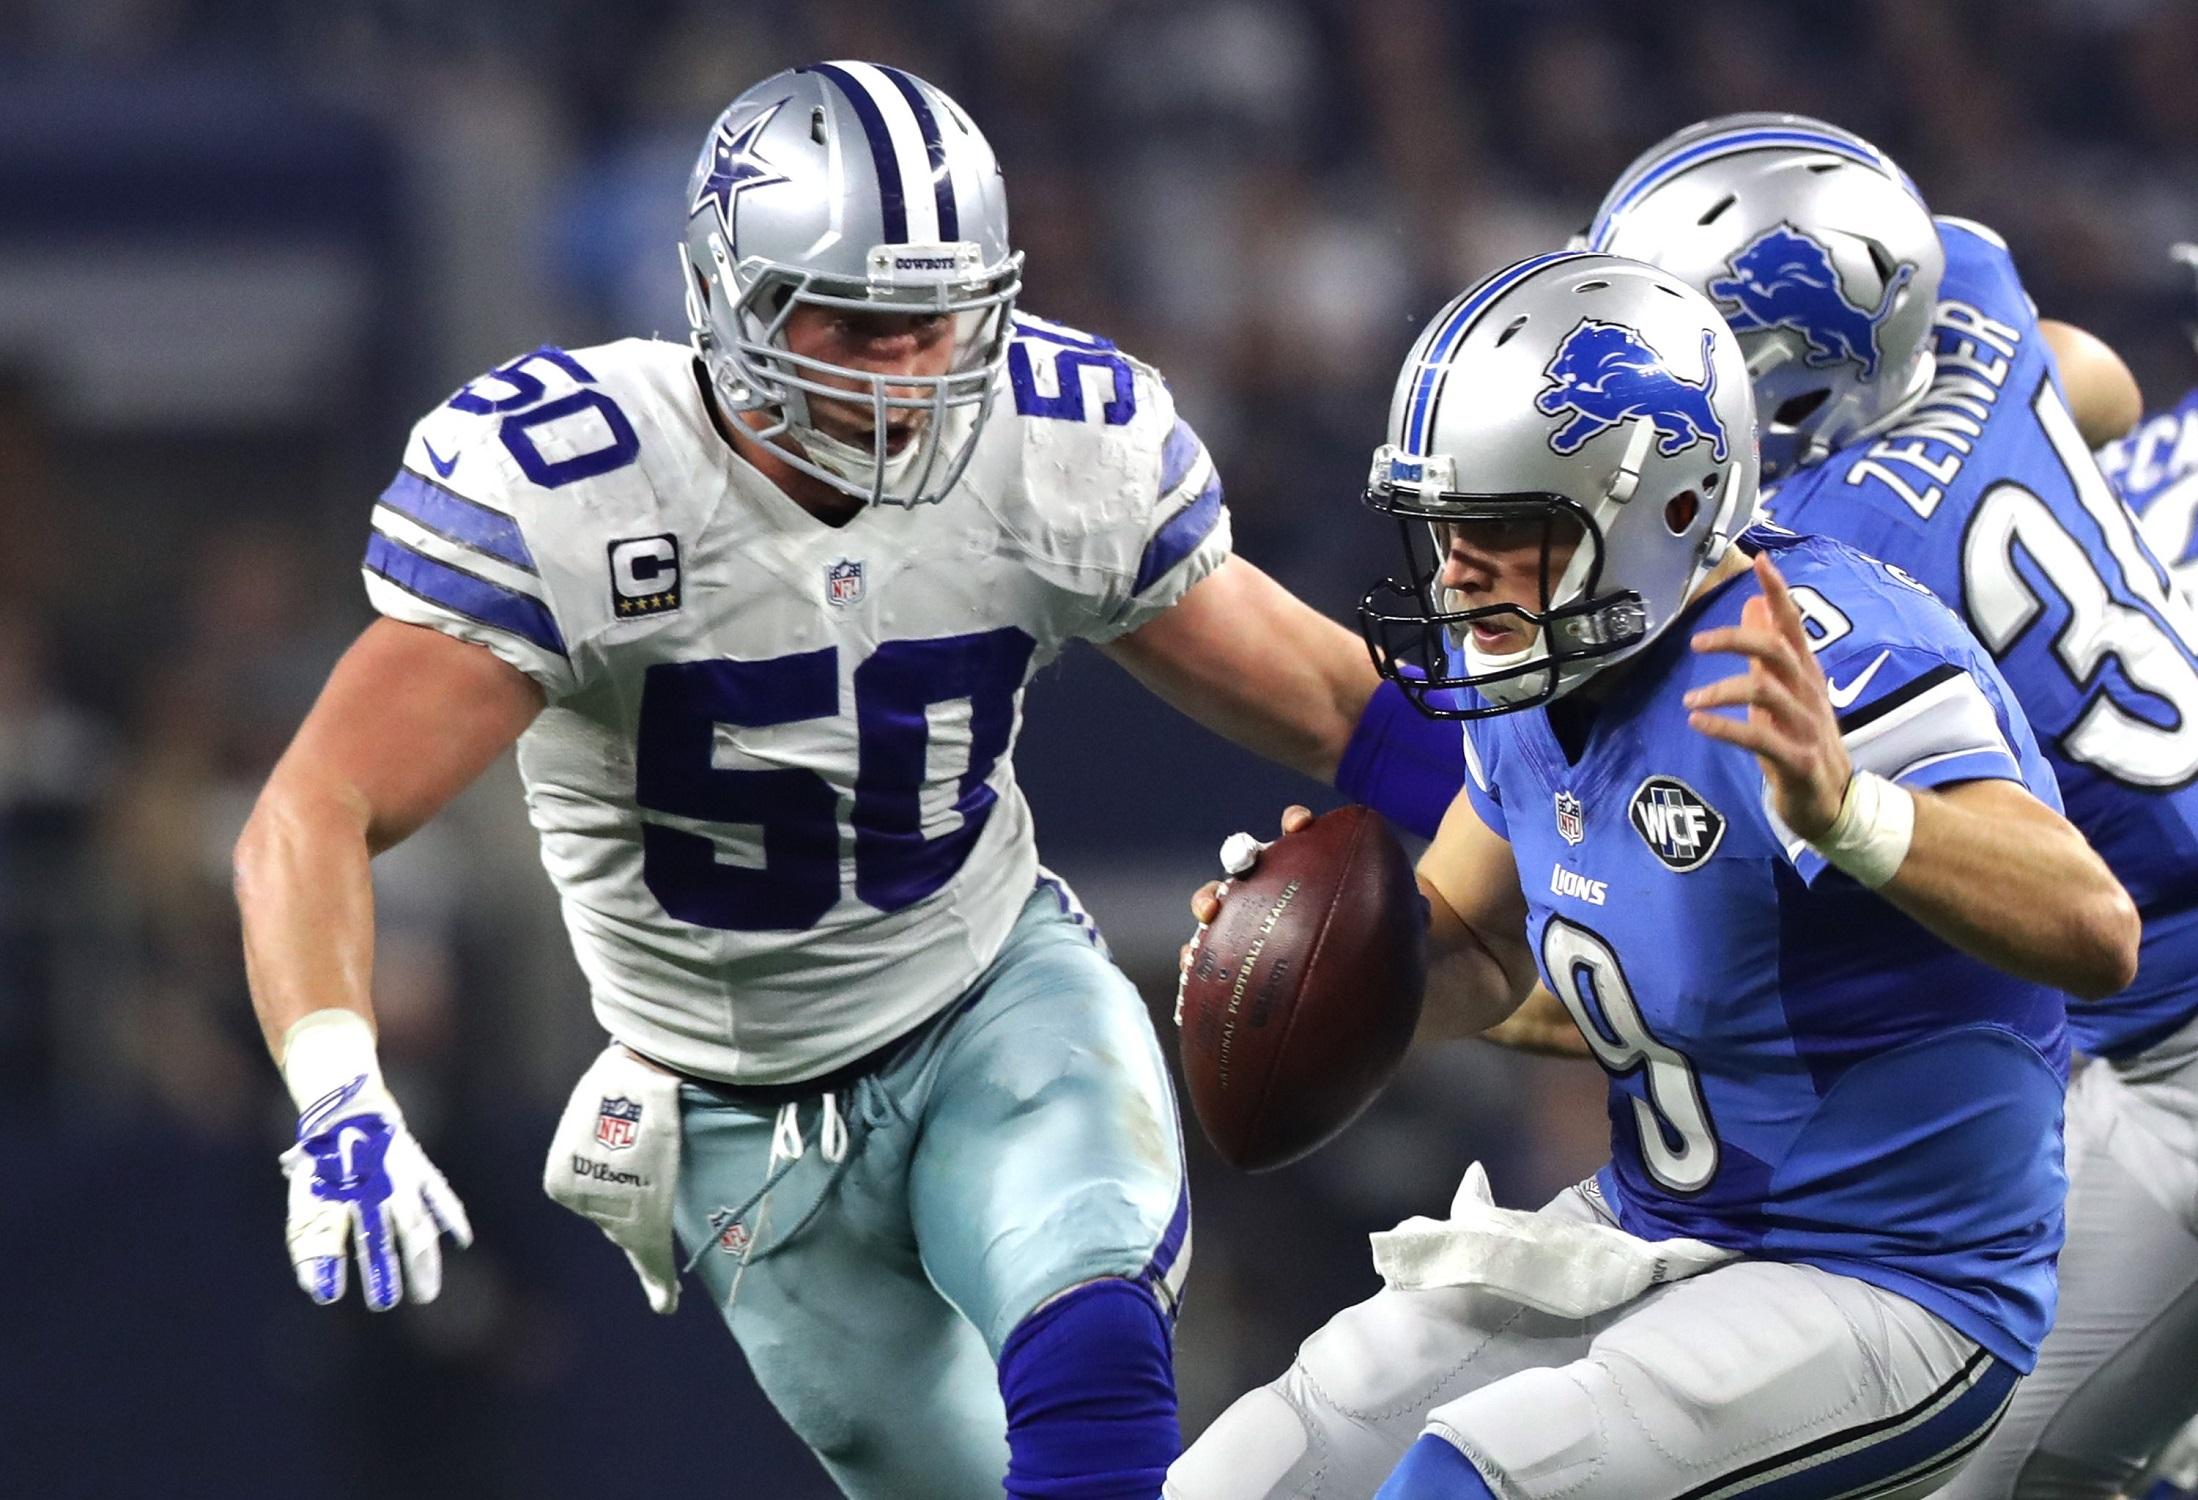 Sean Lee Dallas Cowboys WLB NFL and PFF stats